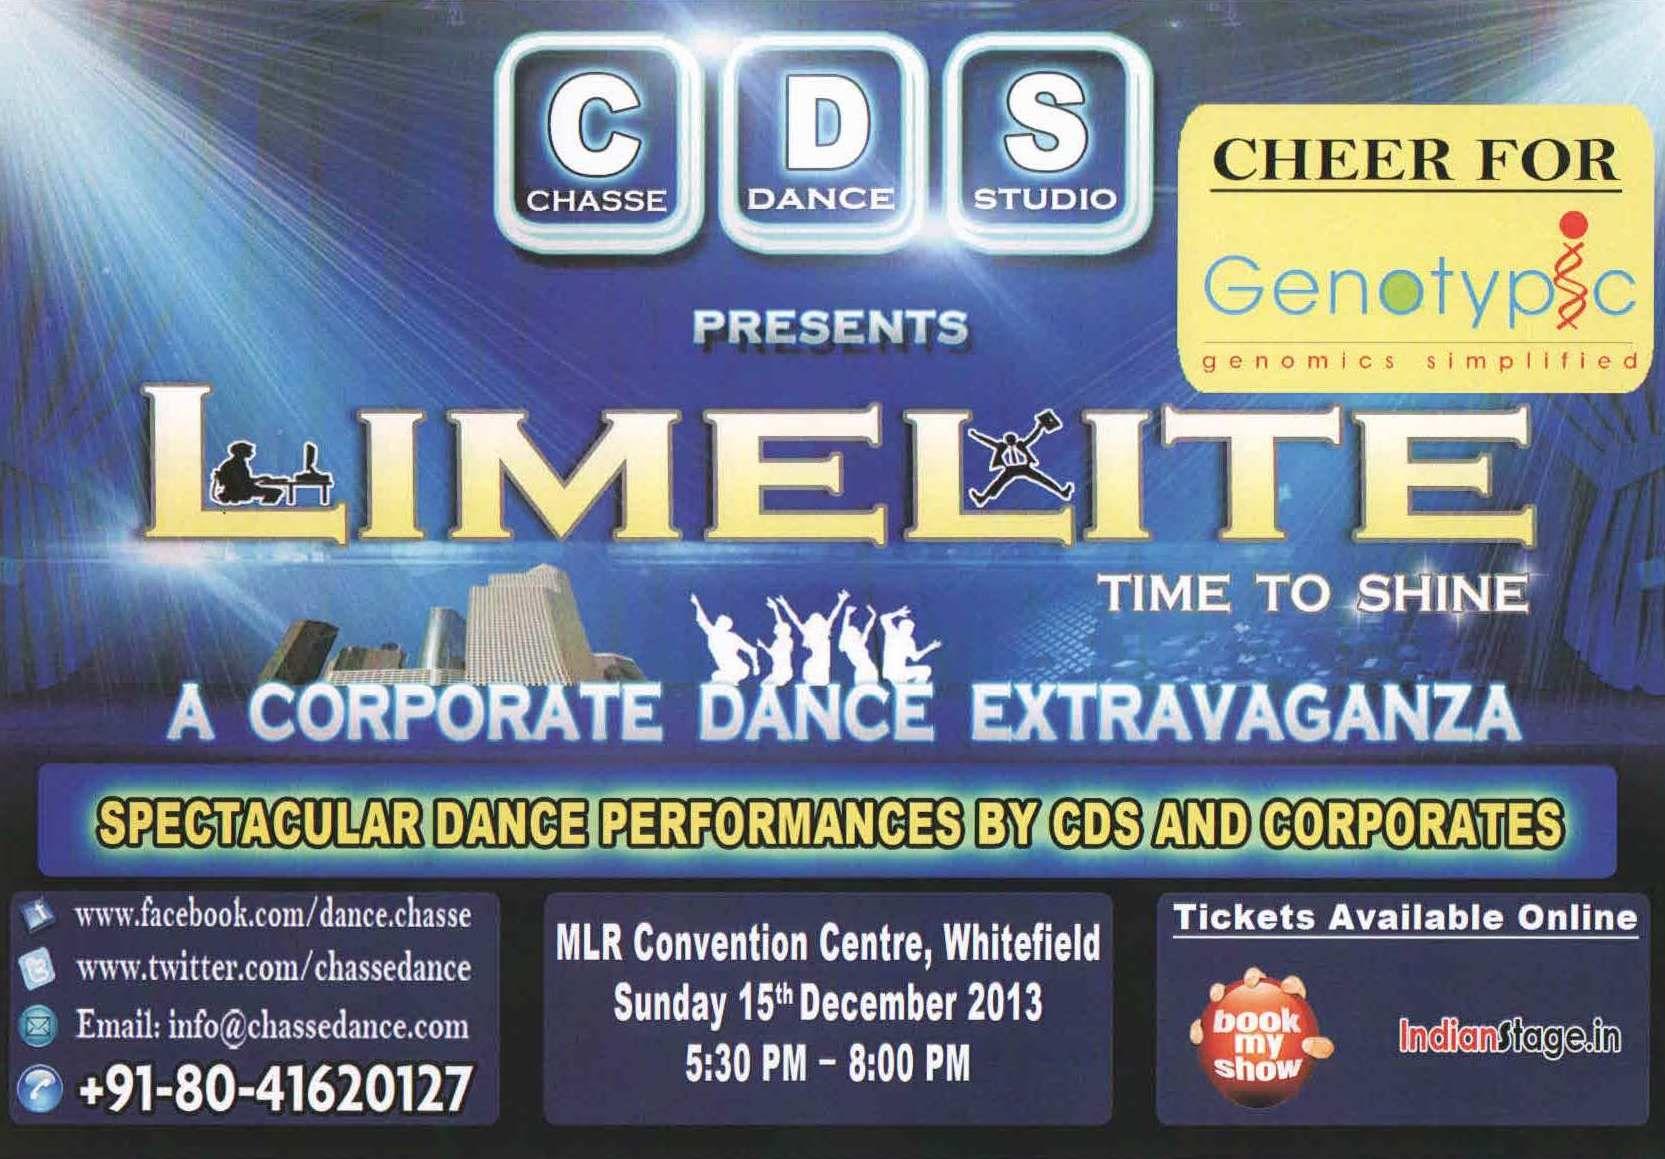 Genotypic participates in the LIMELITE A Corporate Dance